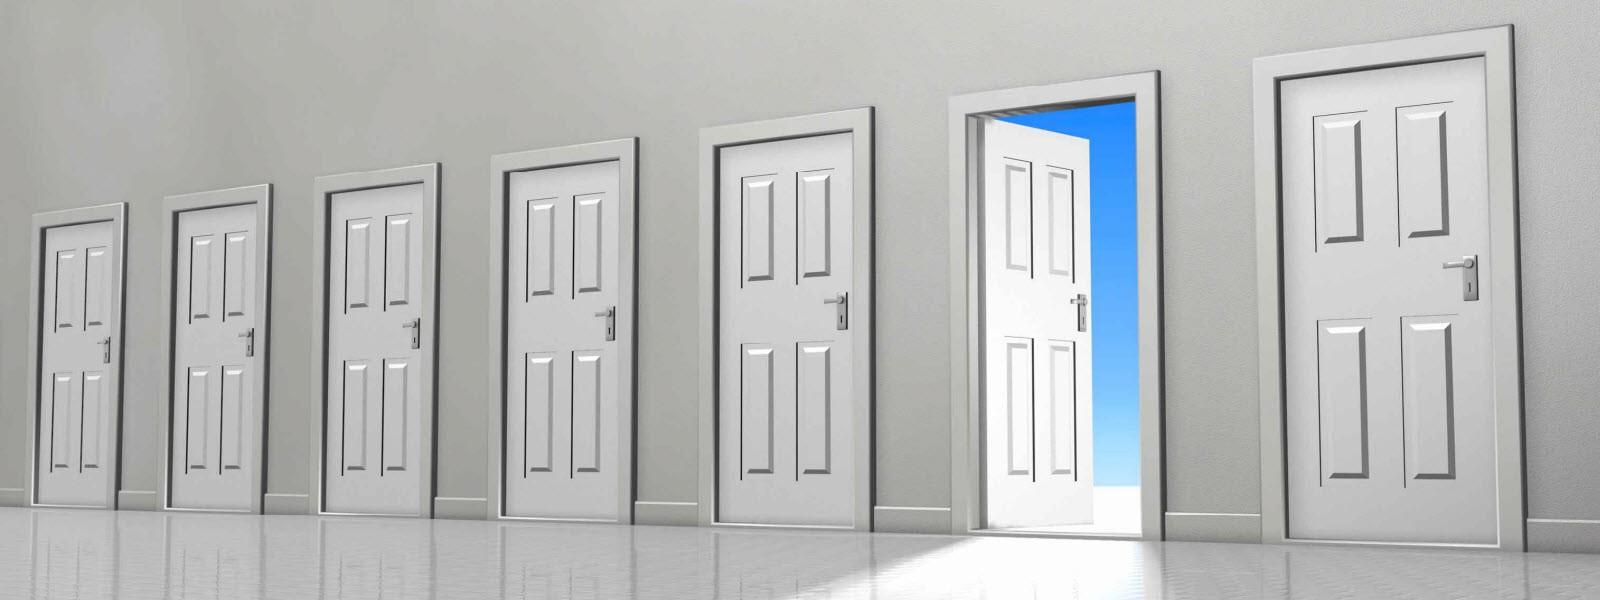 Channel Management PartnerPortal Opens Up New Doors